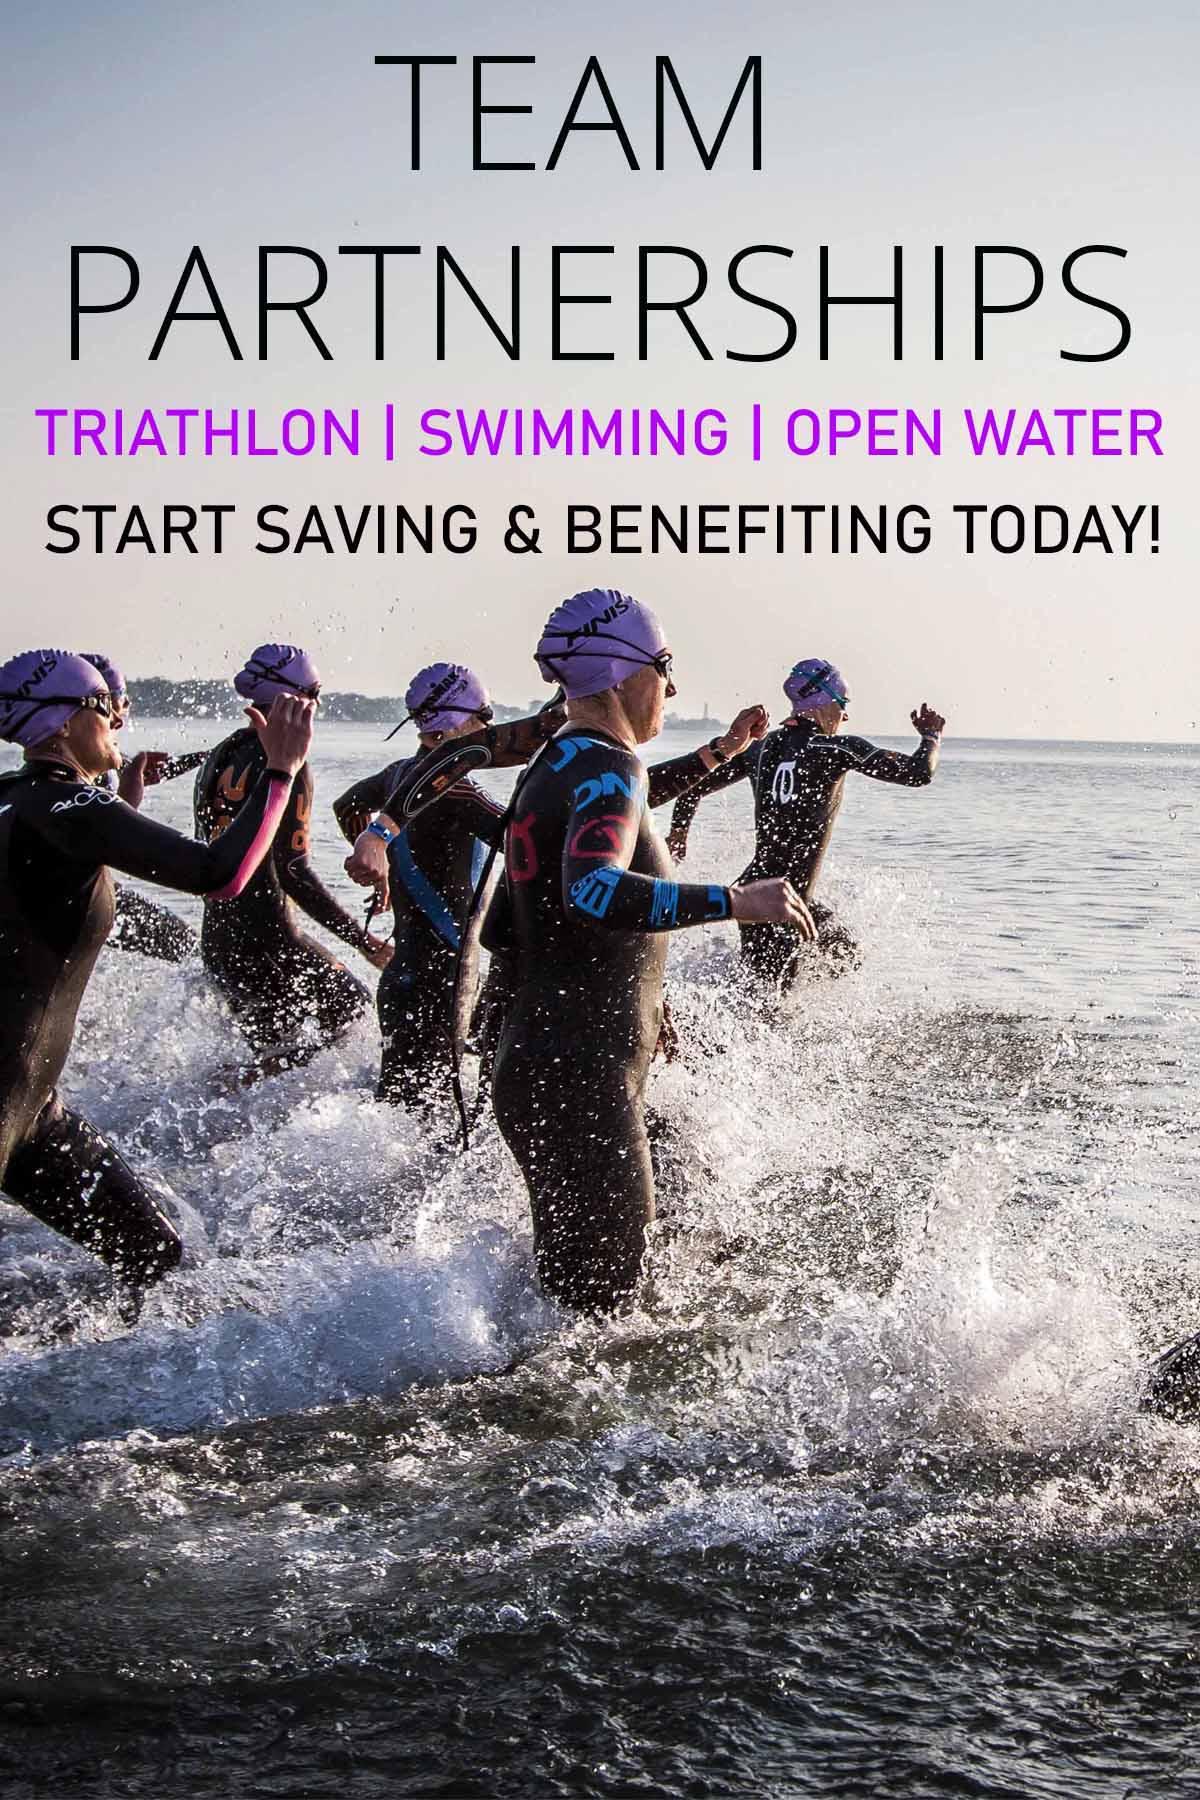 Team Partnership Swimming, Triathlon